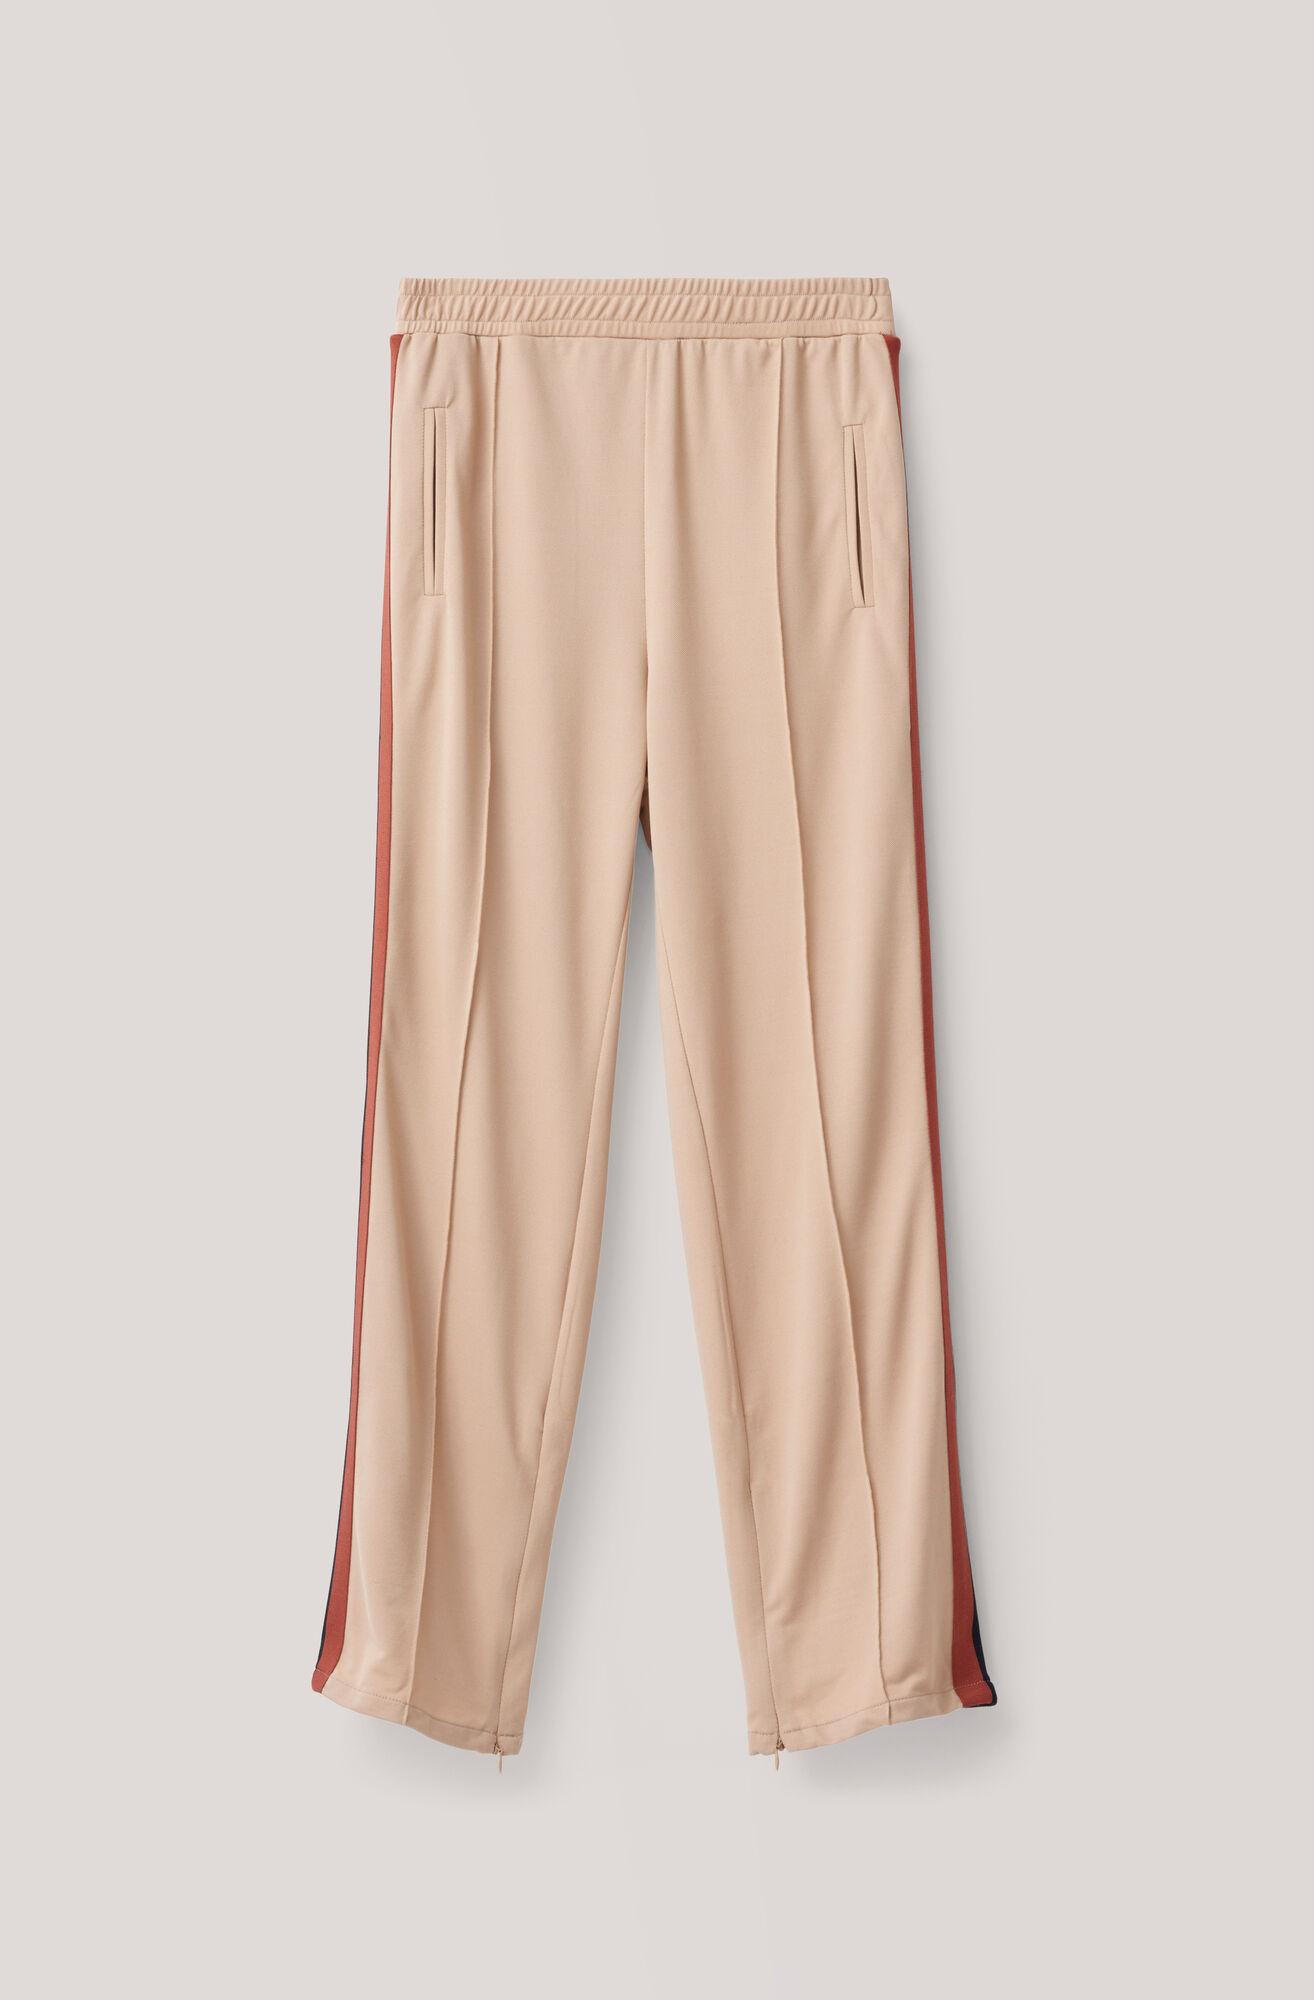 Dubois Polo Pants, Cuban Sand, hi-res